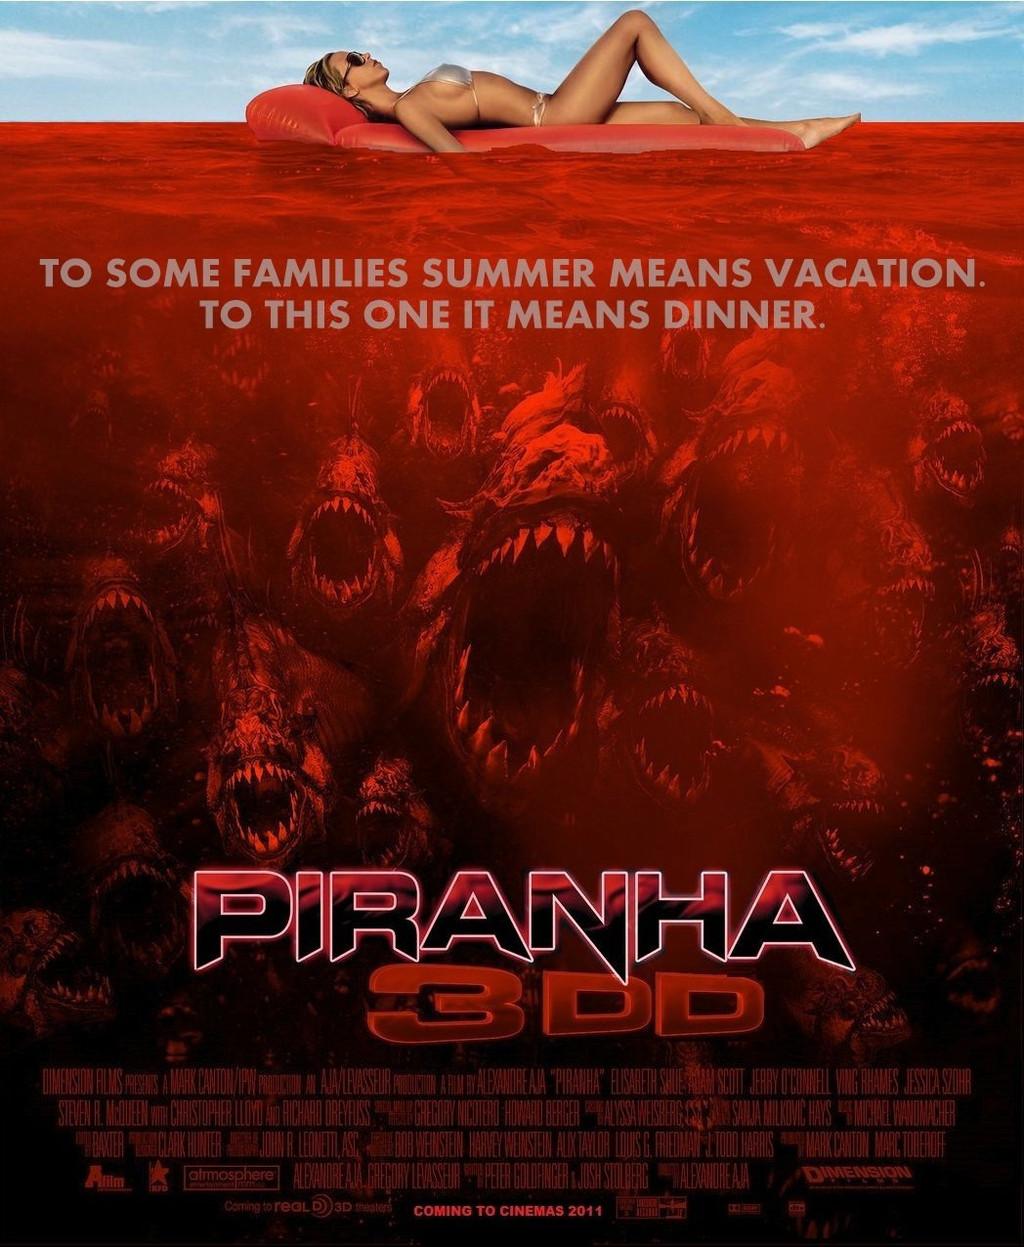 piranha 3dd full movie in hindi free download hd